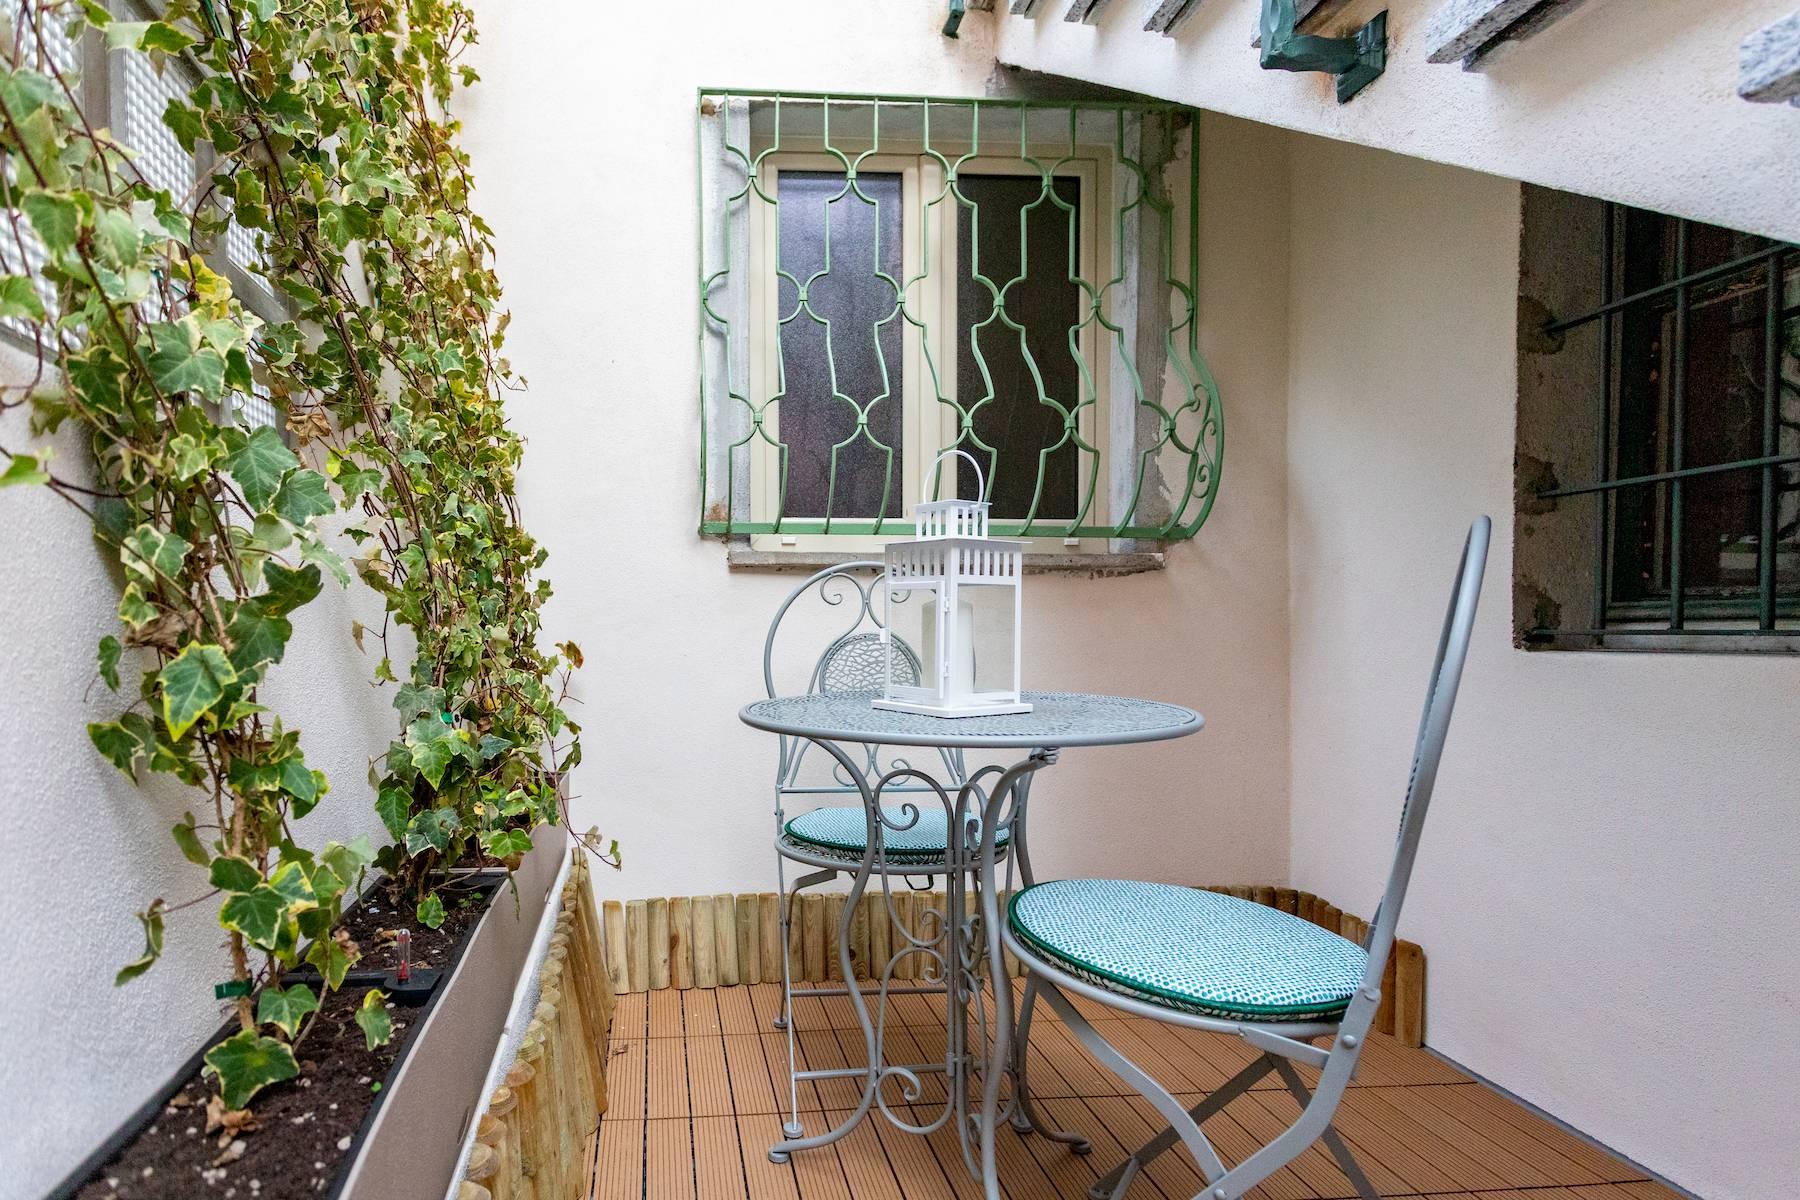 Appartamento in Vendita a Belgirate: 3 locali, 62 mq - Foto 4